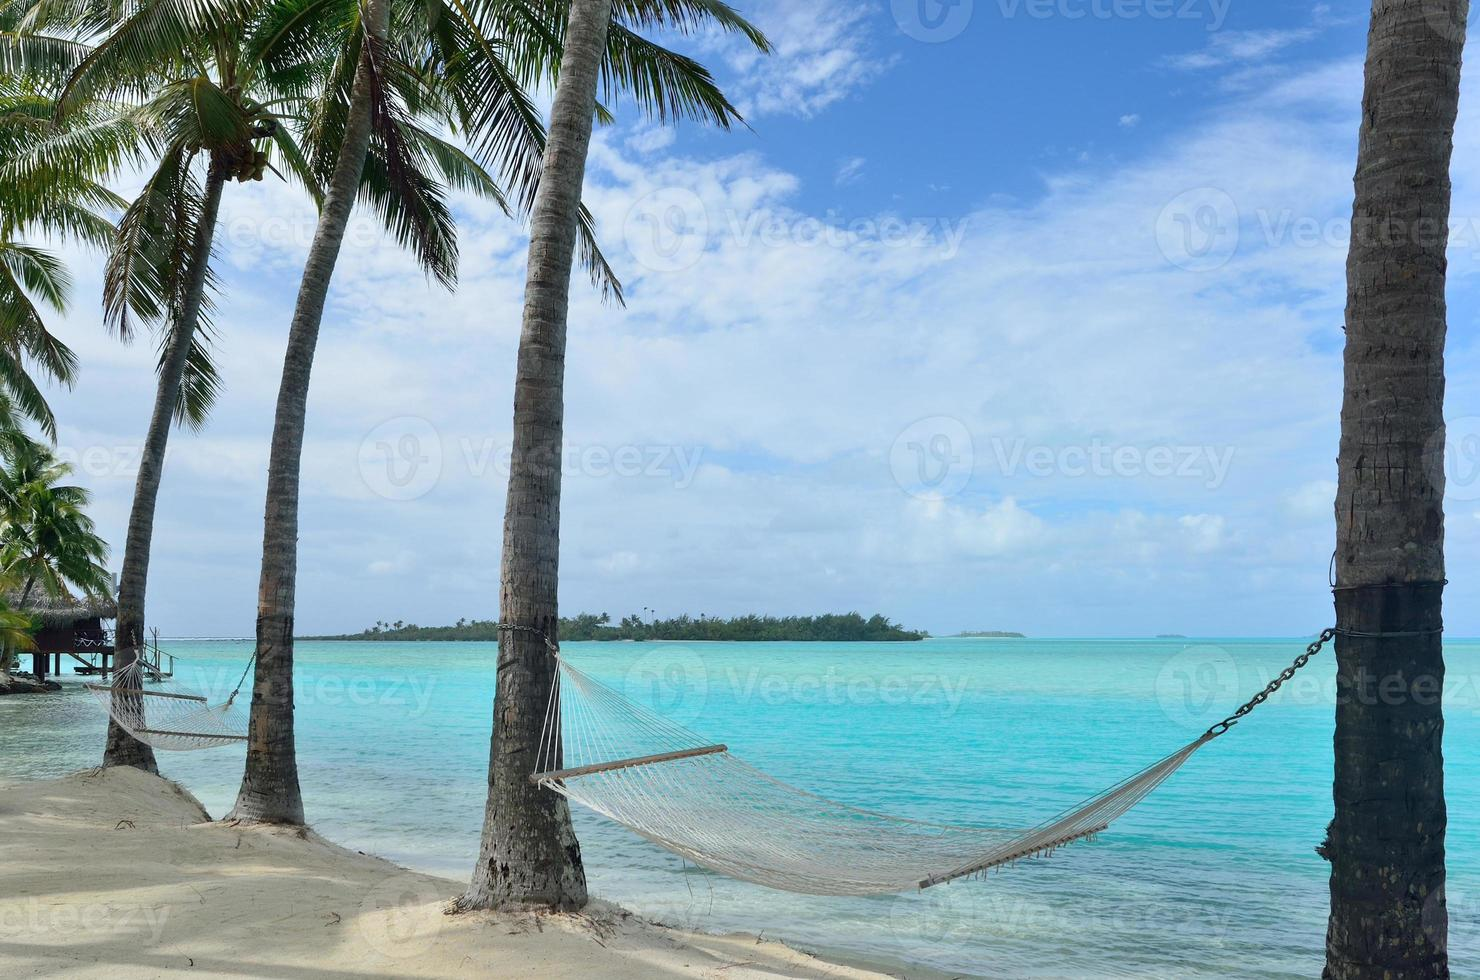 amaca sull'isola tropicale foto